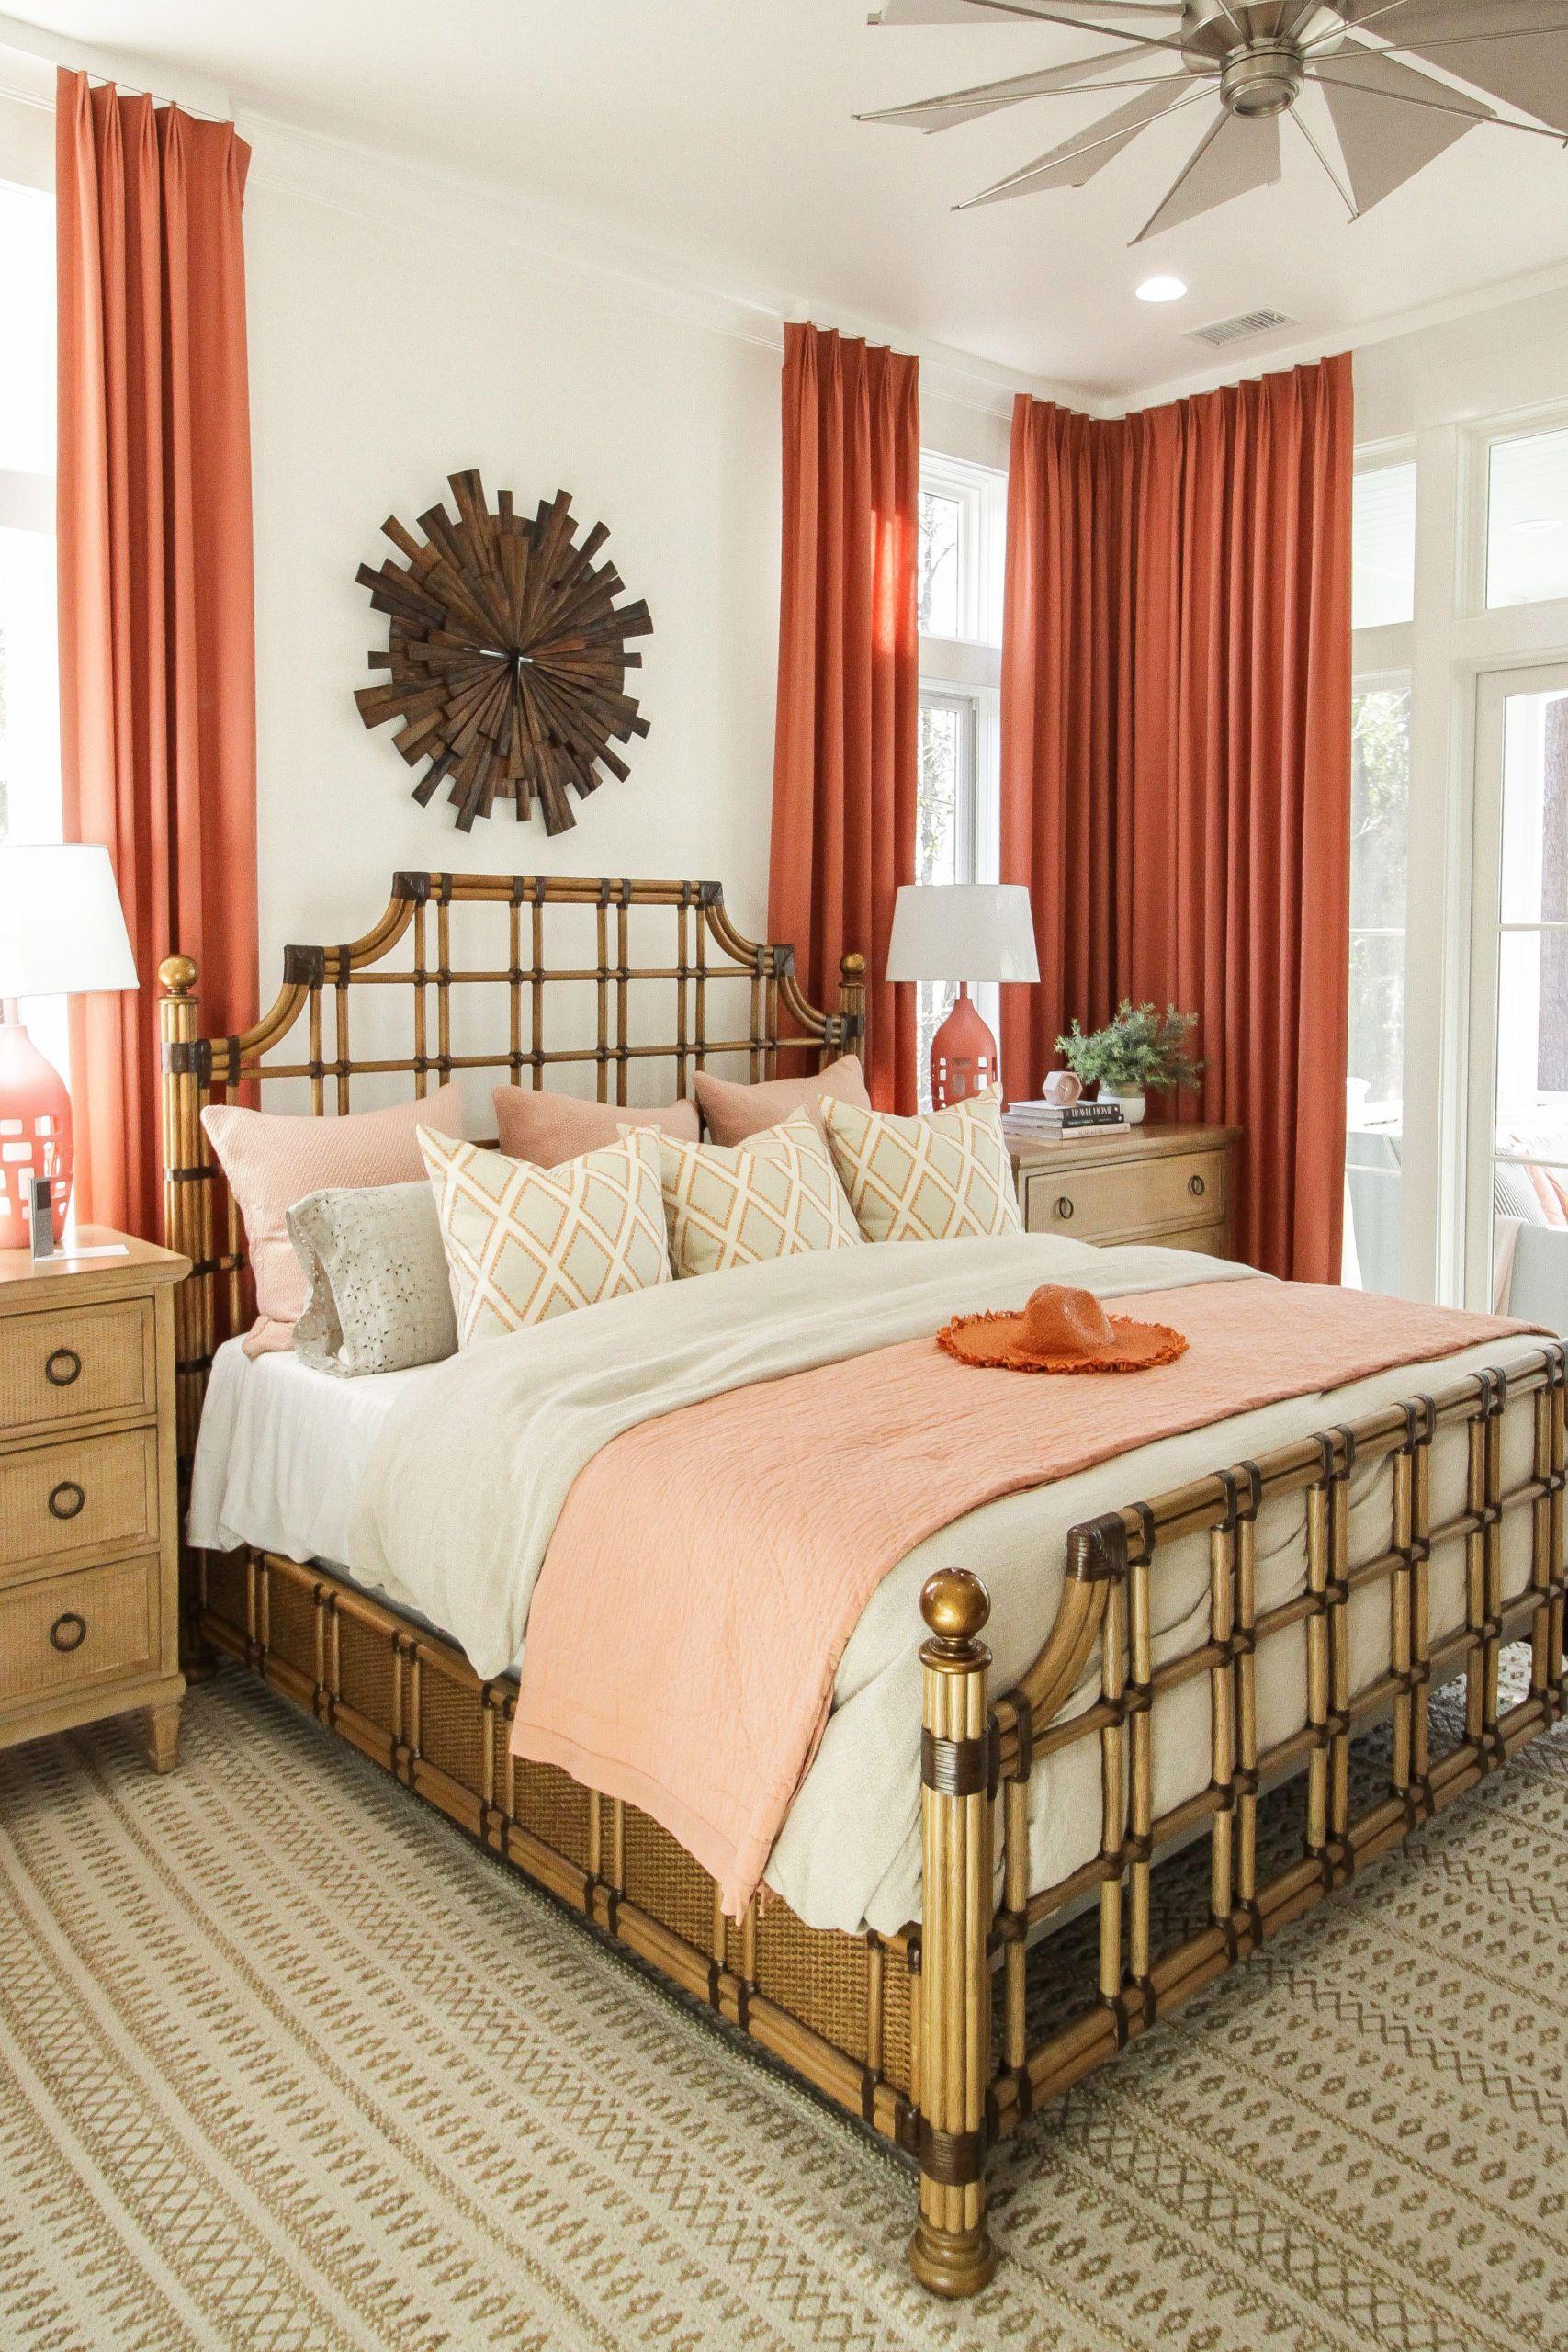 The HGTV Dream Home 2020 in Hilton Head, South Carolina